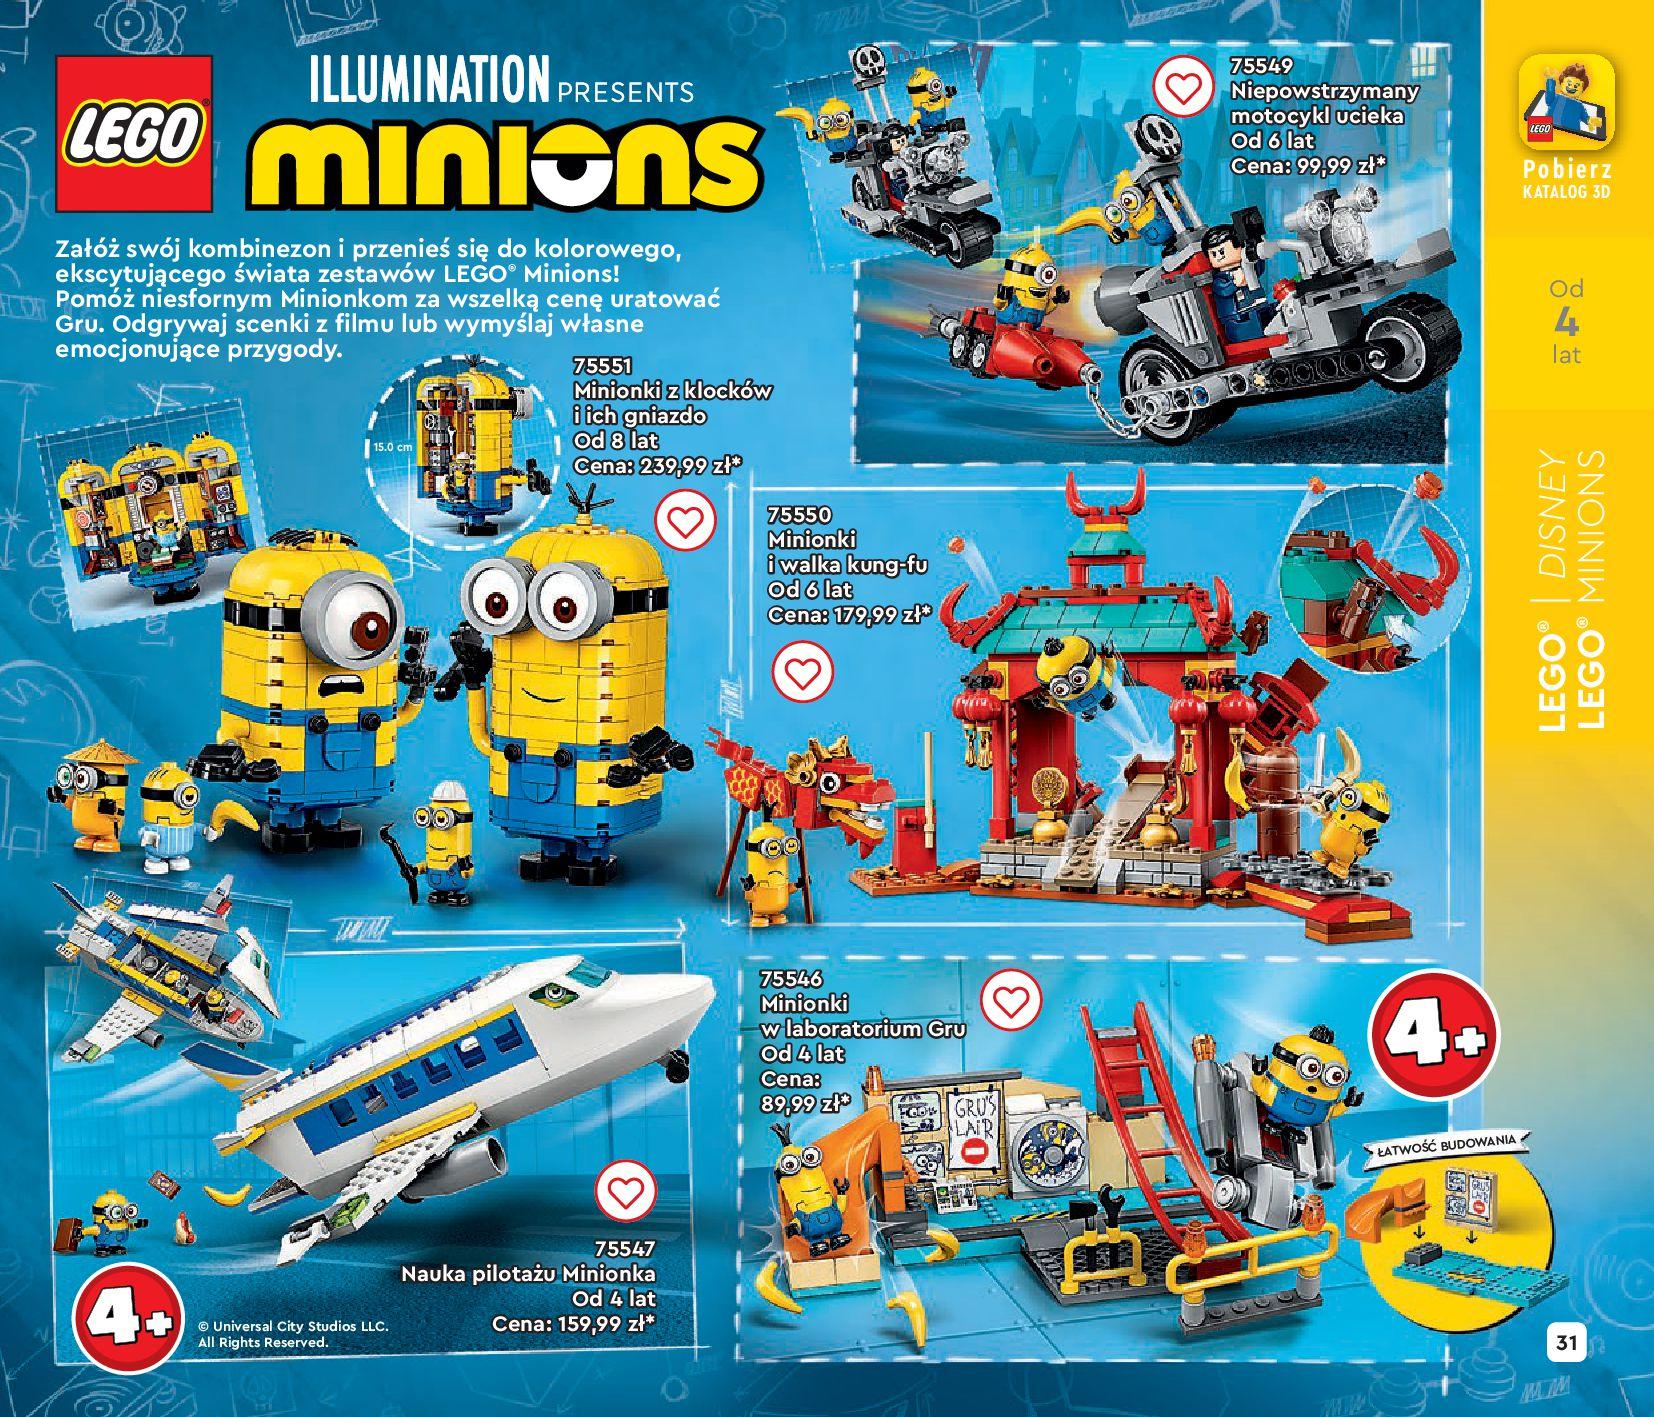 Gazetka LEGO: Gazetka LEGO - katalog 2021-06-30 page-31